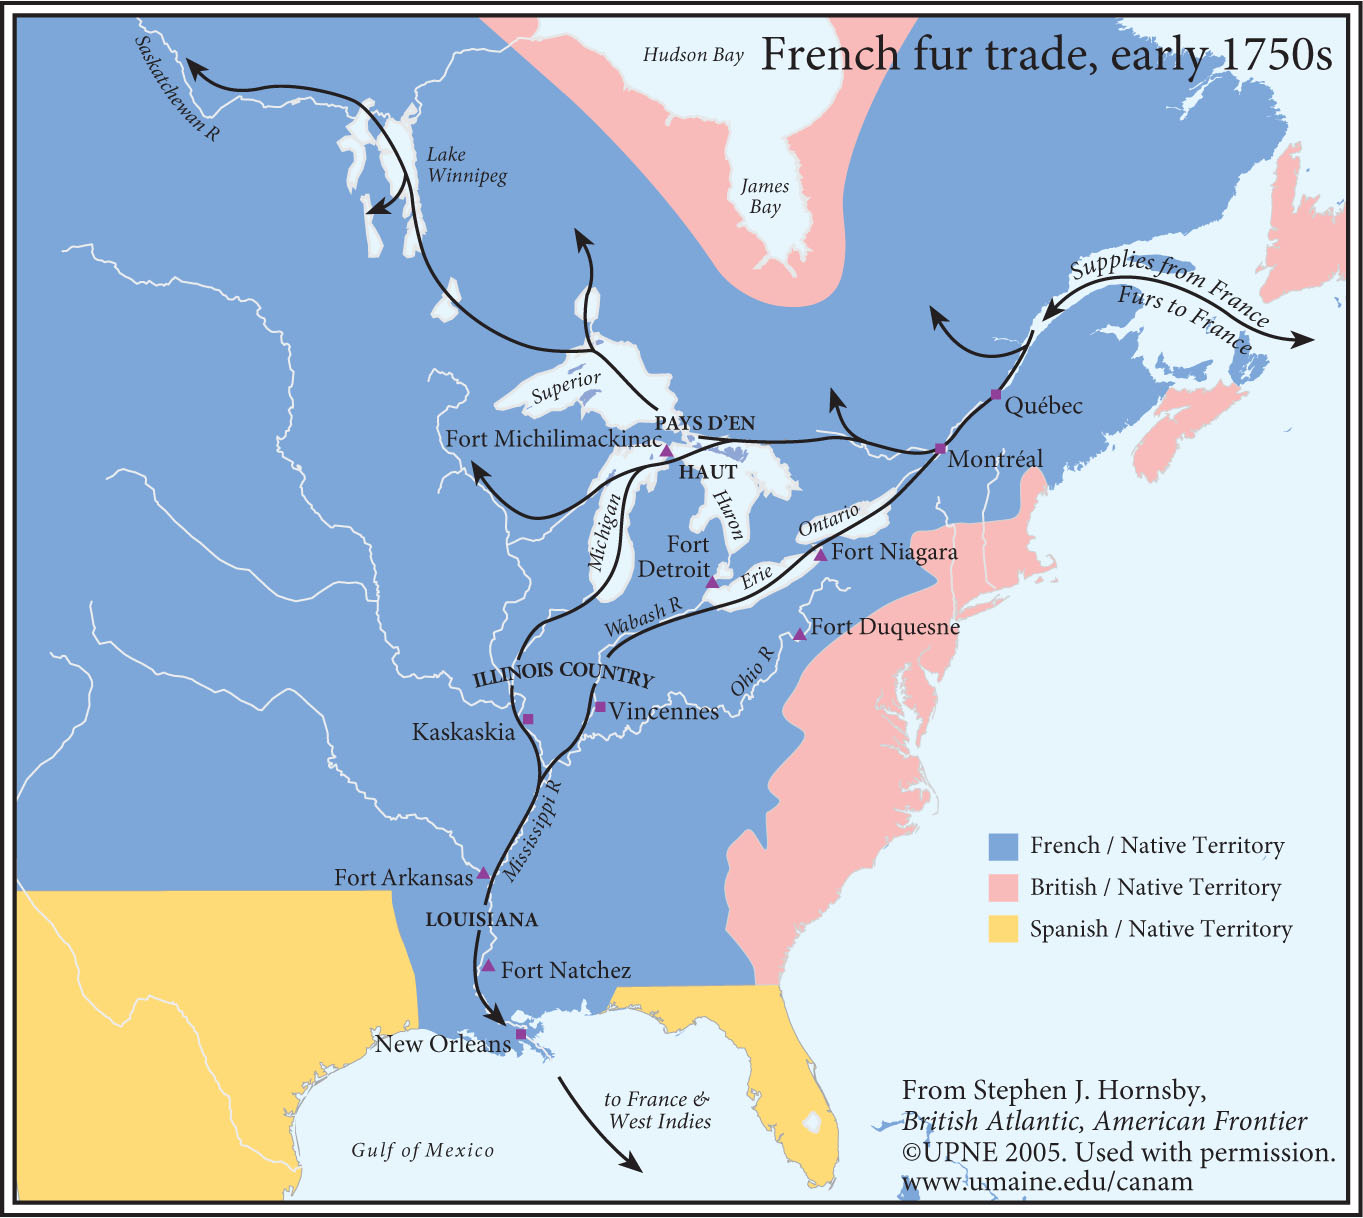 British Atlantic American Frontier CanadianAmerican Center